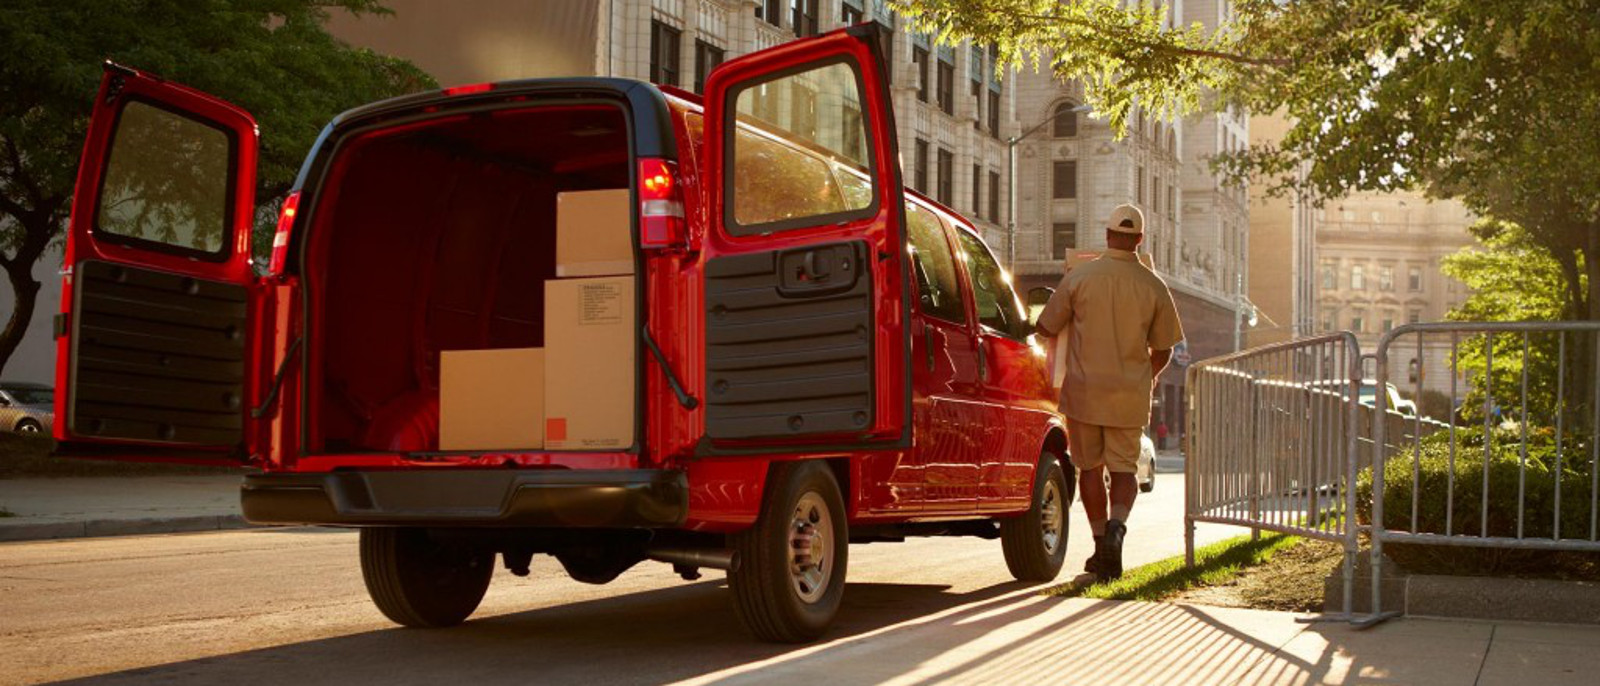 2016 Chevrolet Express Cargo Van rear space